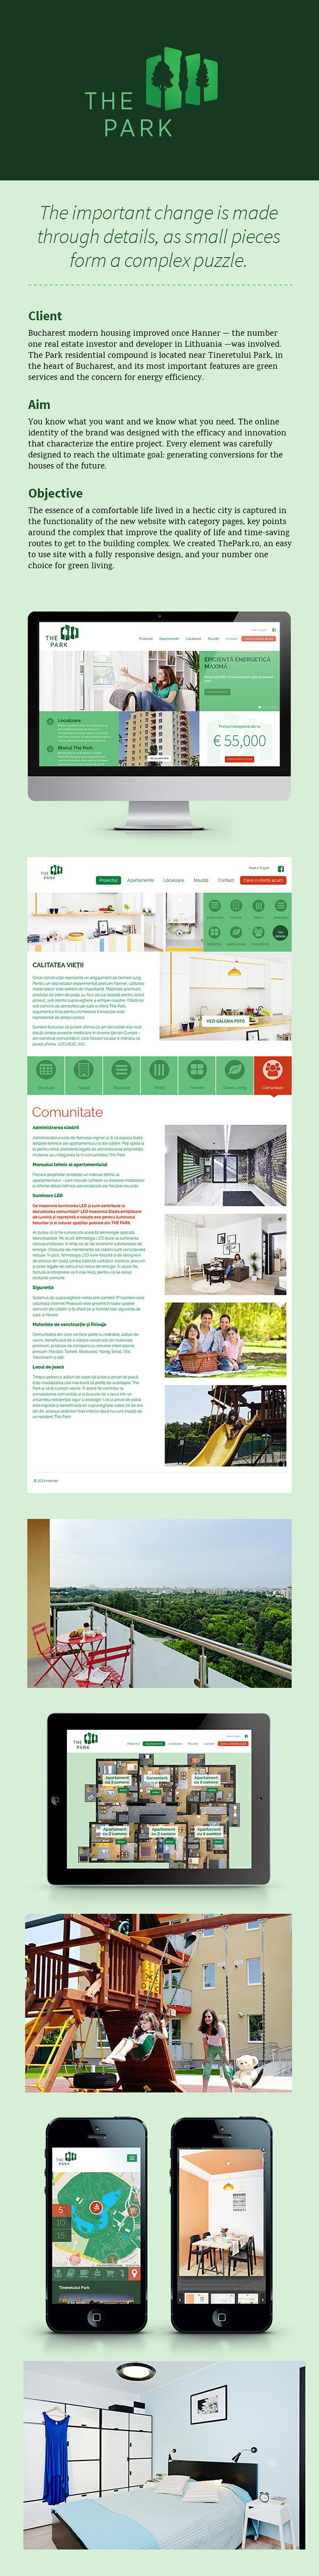 The Park - Website